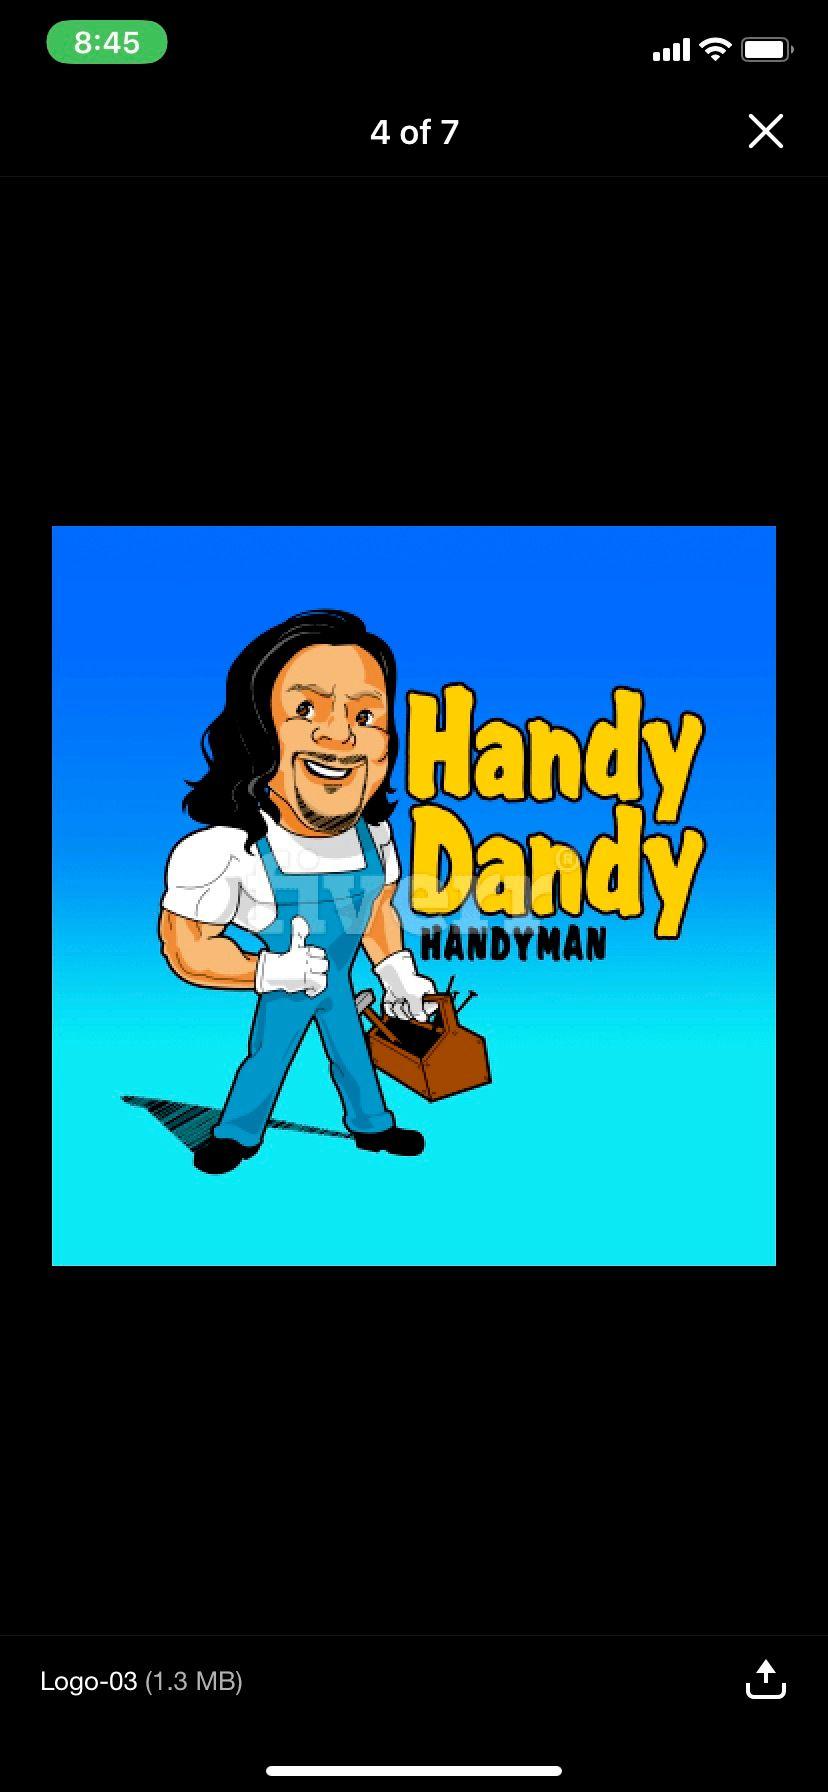 Handy Dandy Handyman